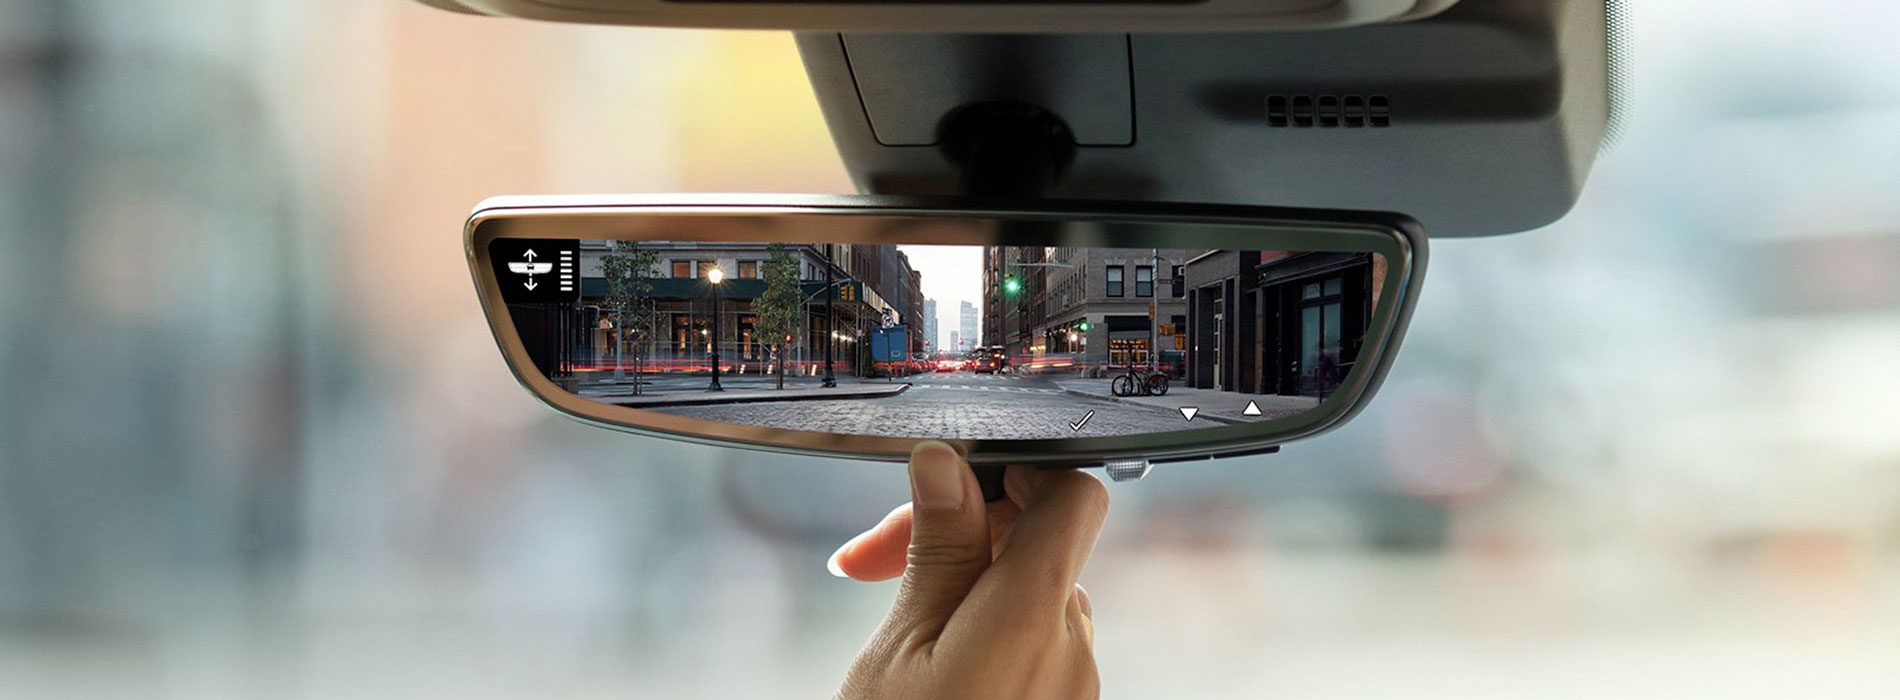 cadillac tecnología urbana